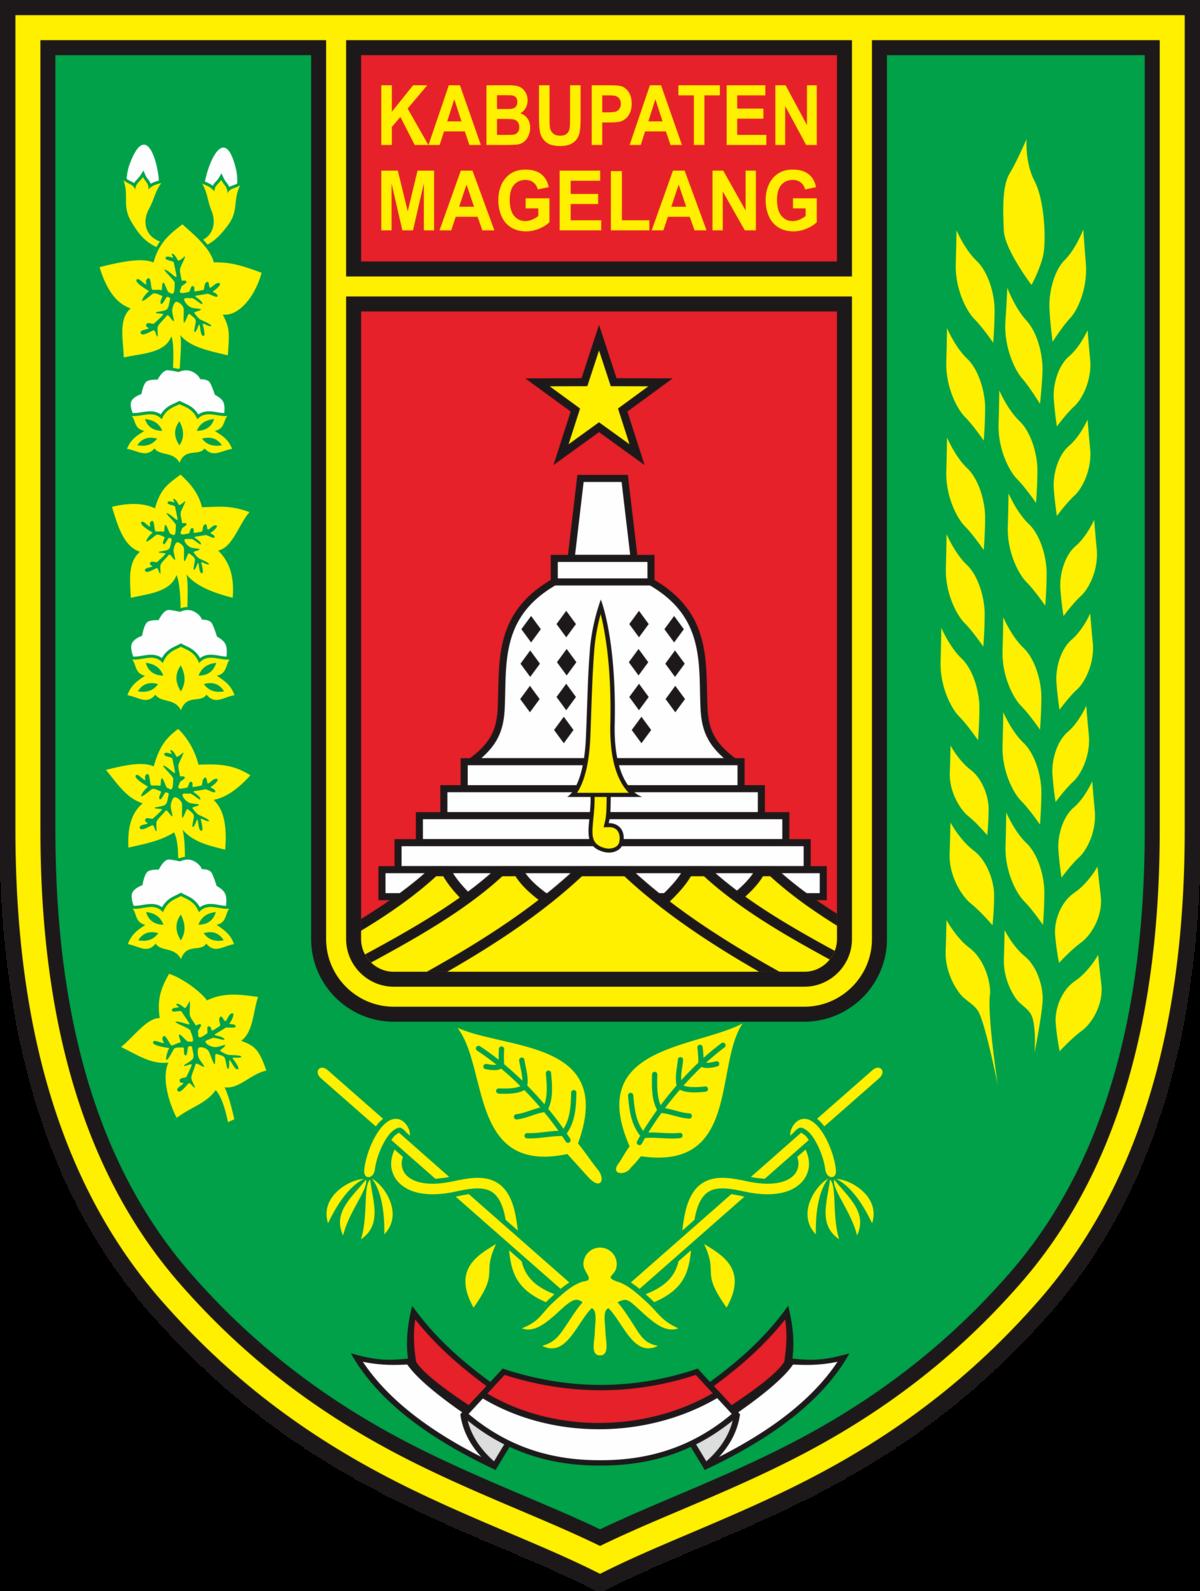 Kabupaten Magelang Wikipedia Bahasa Indonesia Ensiklopedia Bebas Museum Diponegoro Kab